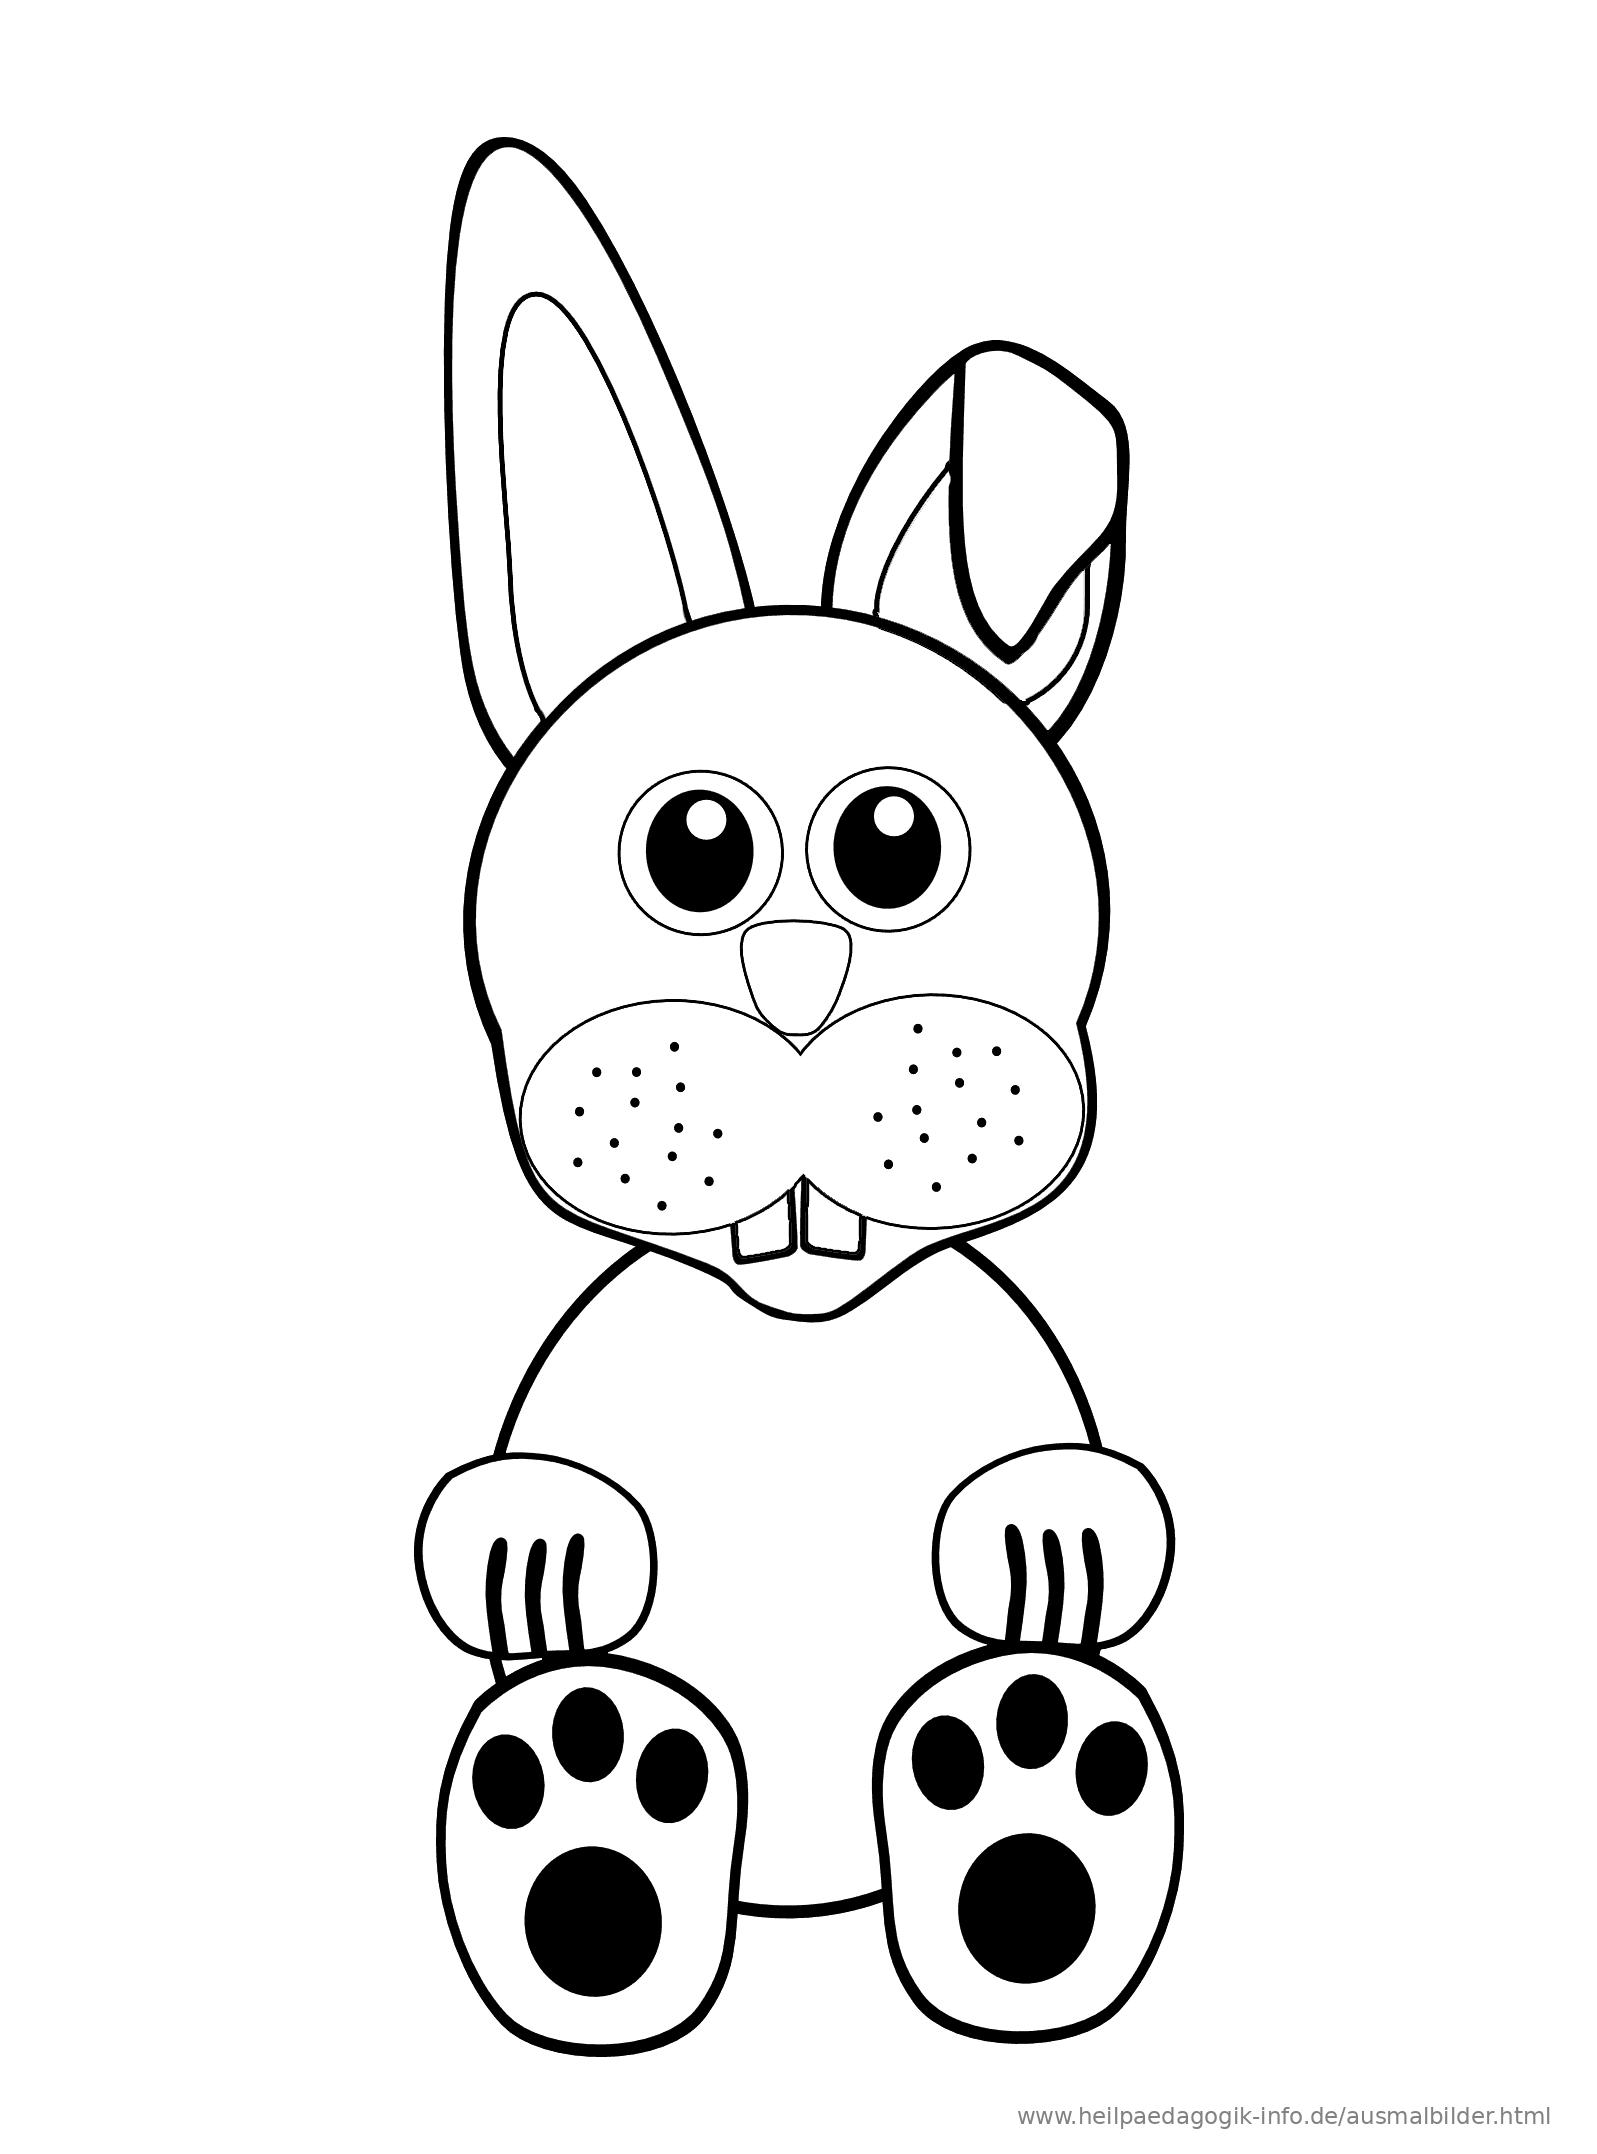 Ausmalbilder Hasen